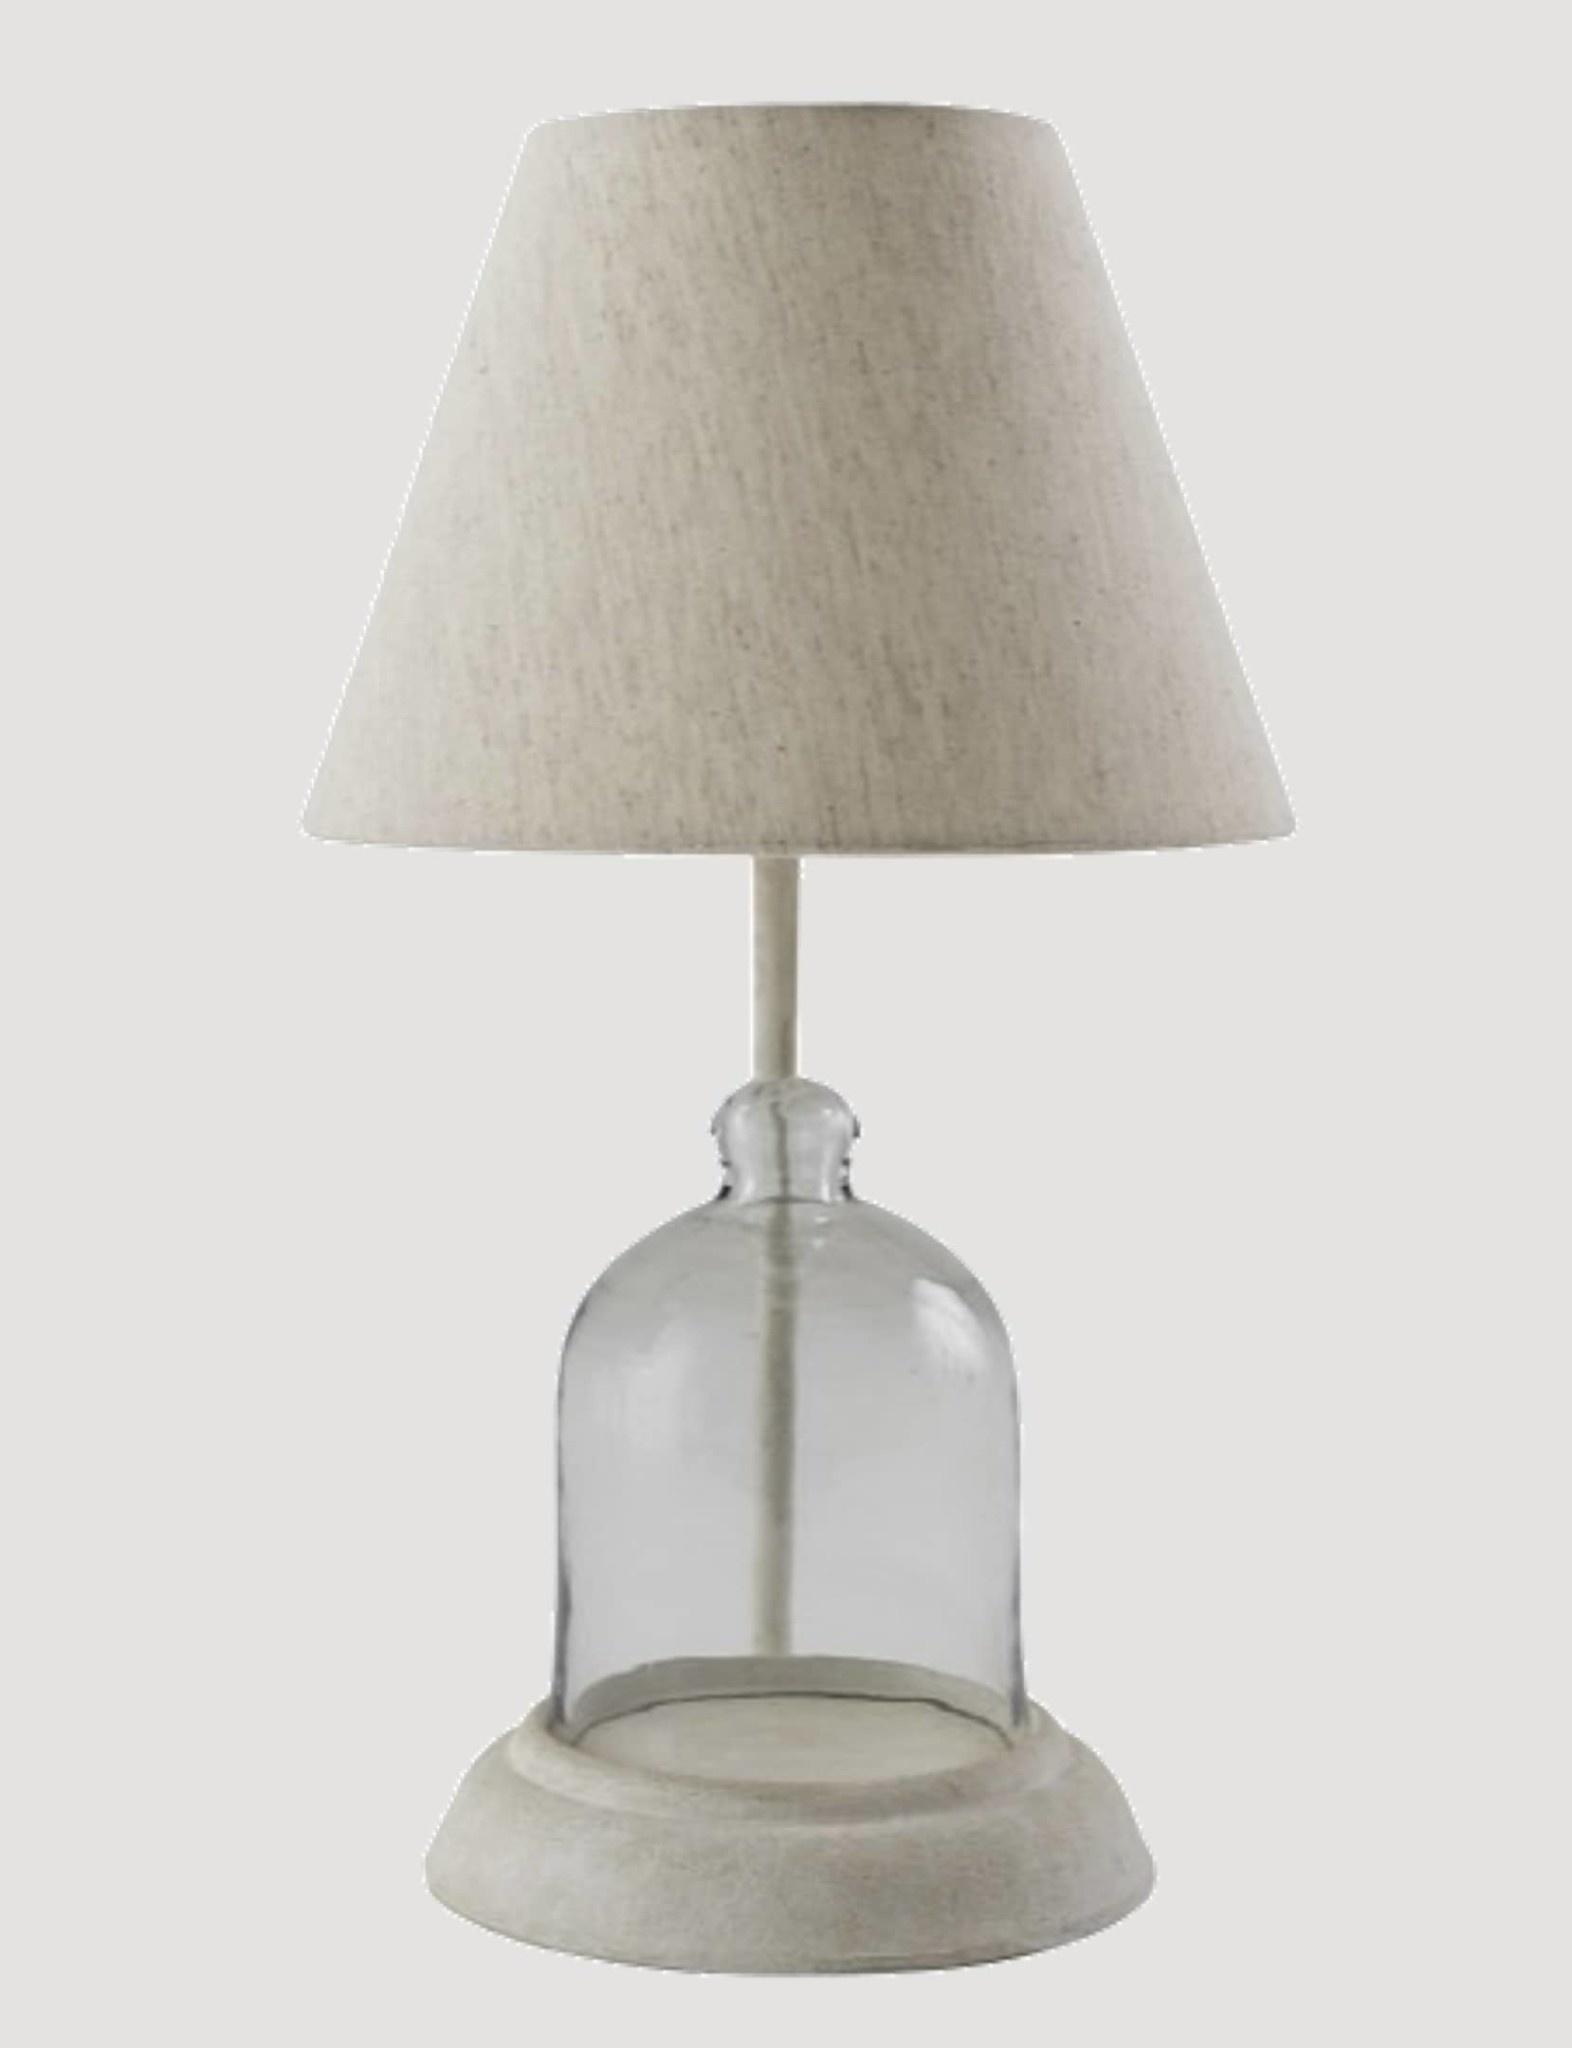 Park Designs Bell Cloche Lamp W/Shade